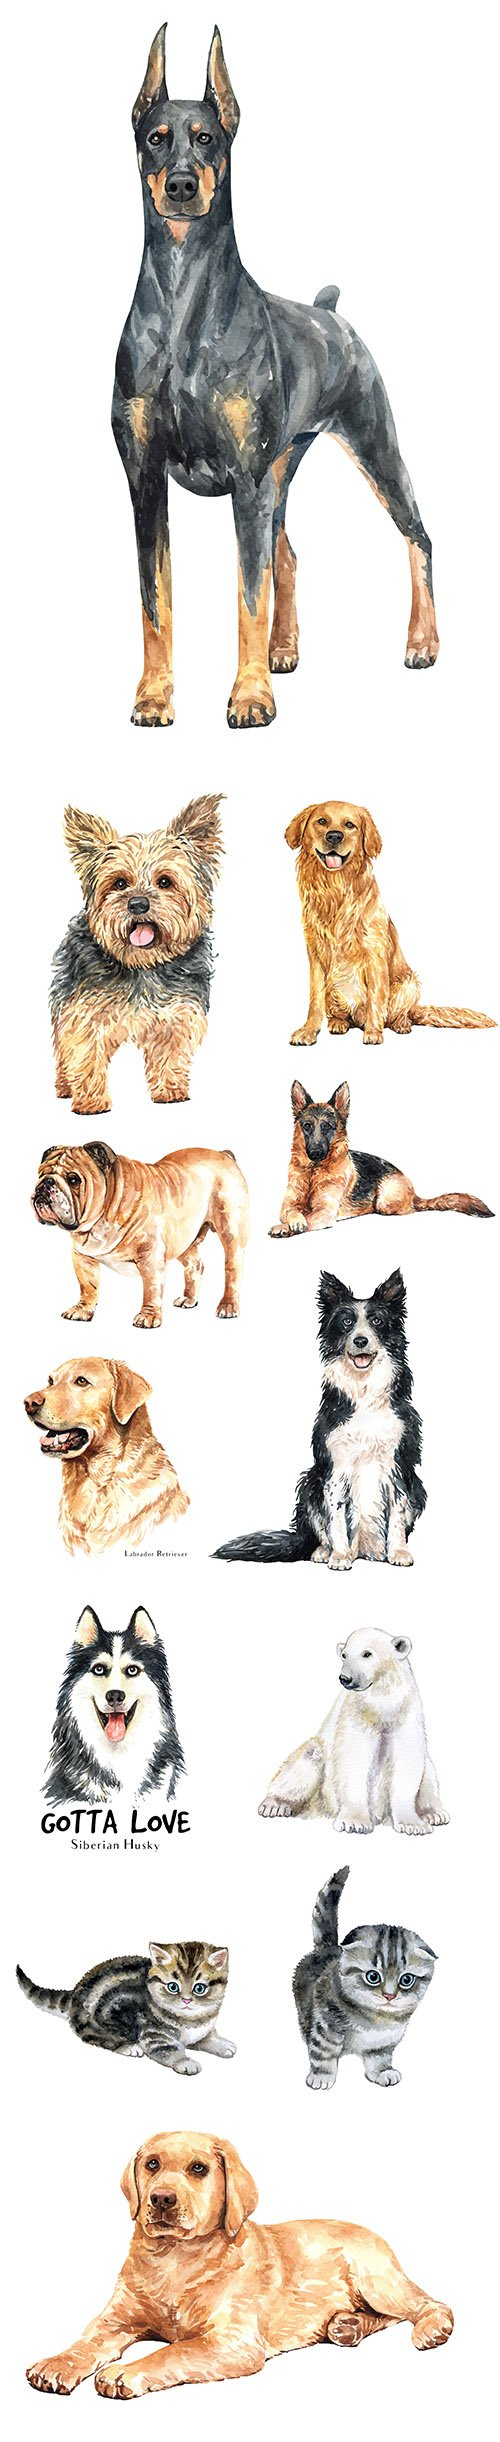 Watercolor Printing Animals Vol 7